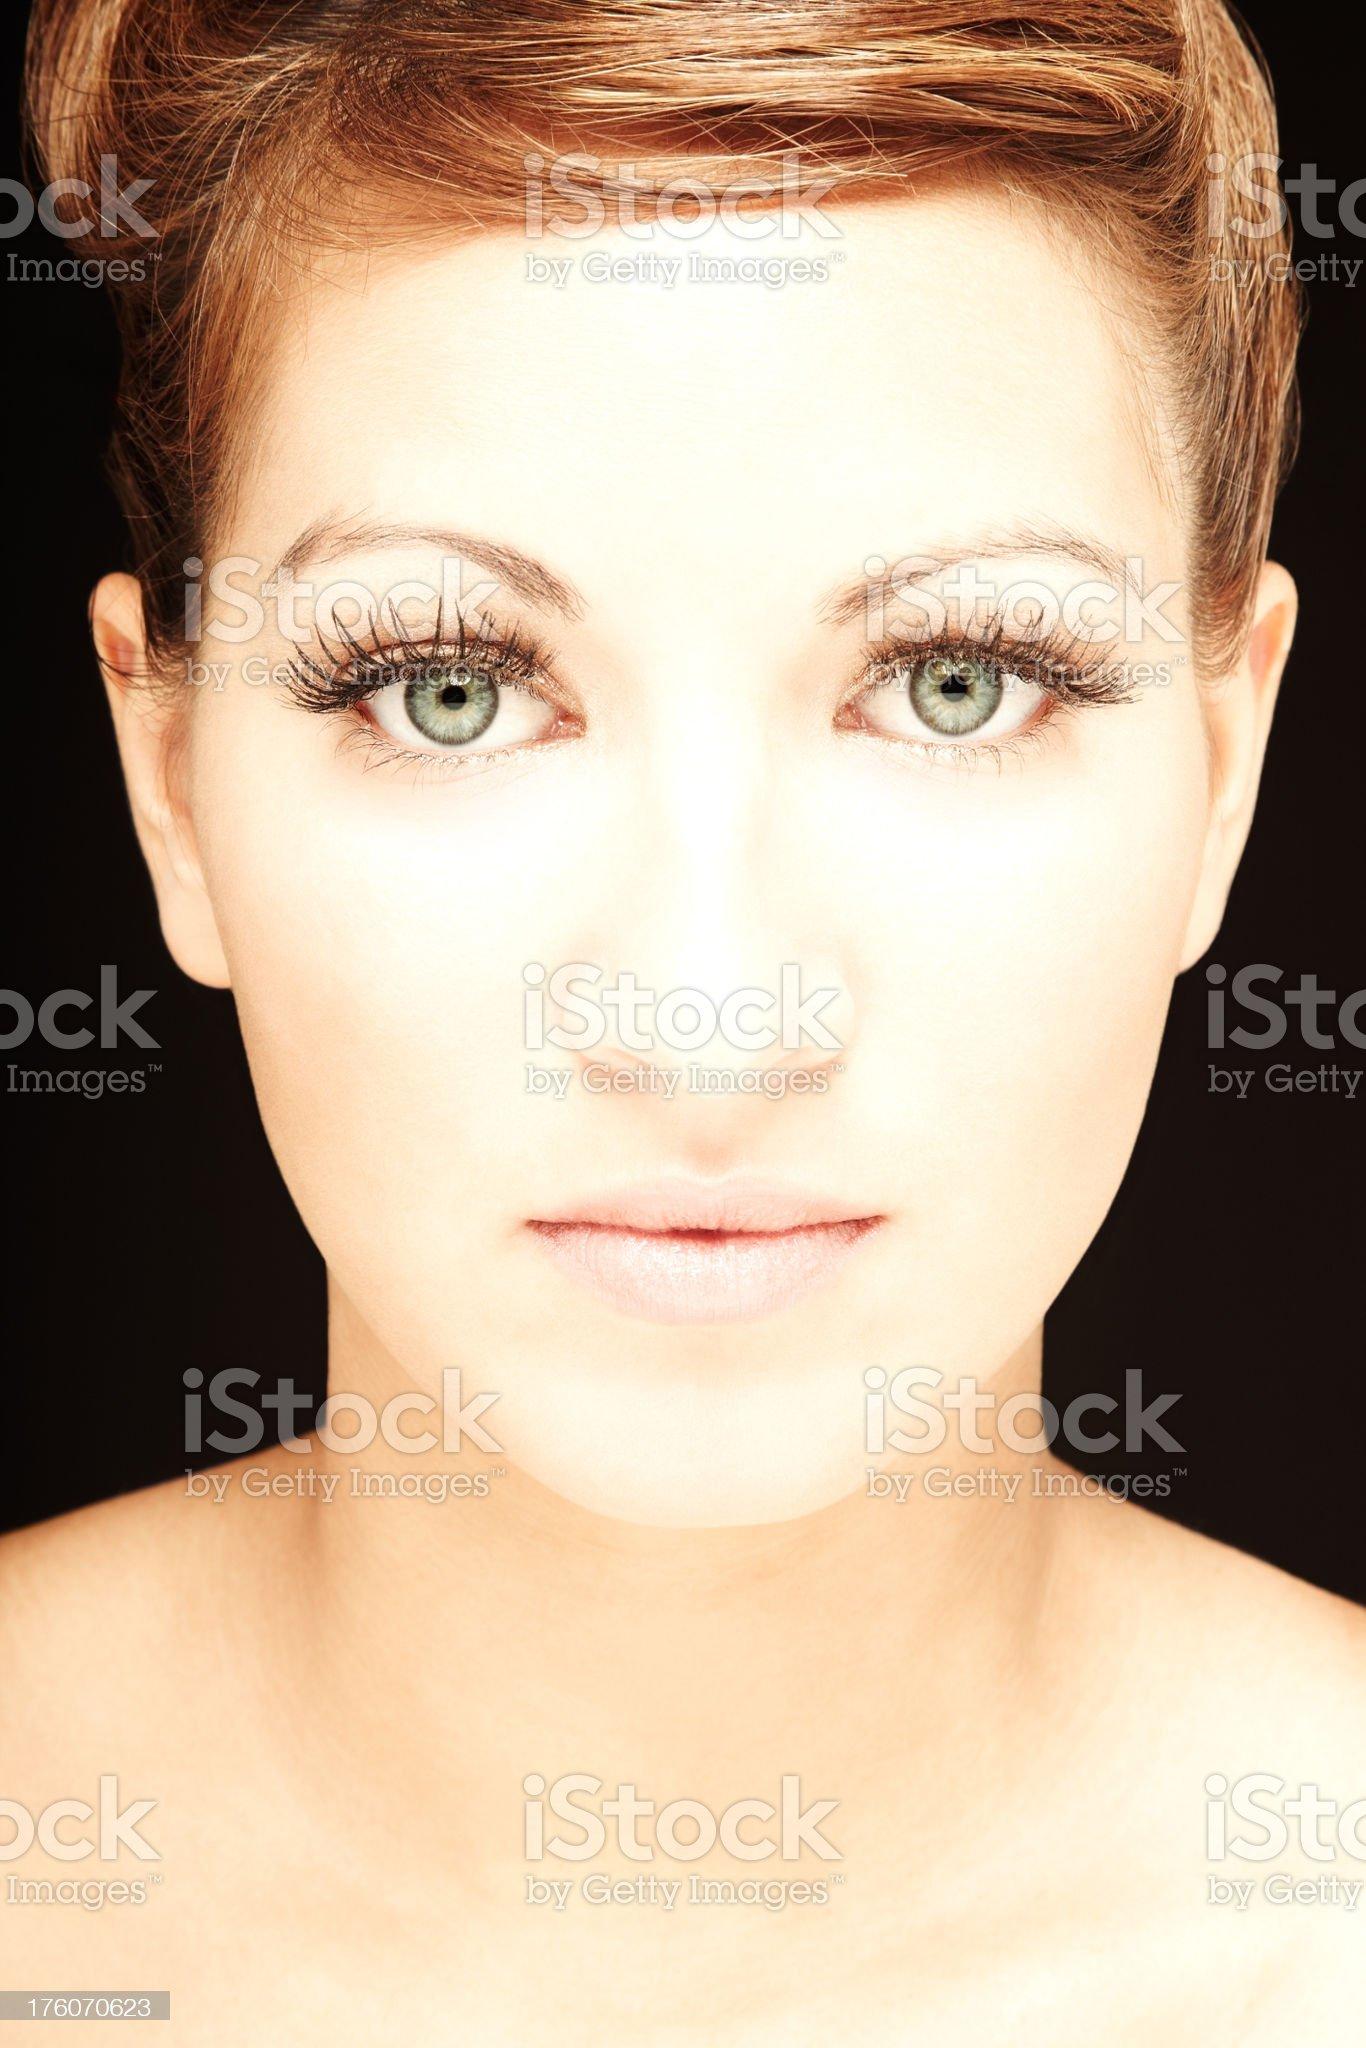 Young Female Model's Headshot royalty-free stock photo